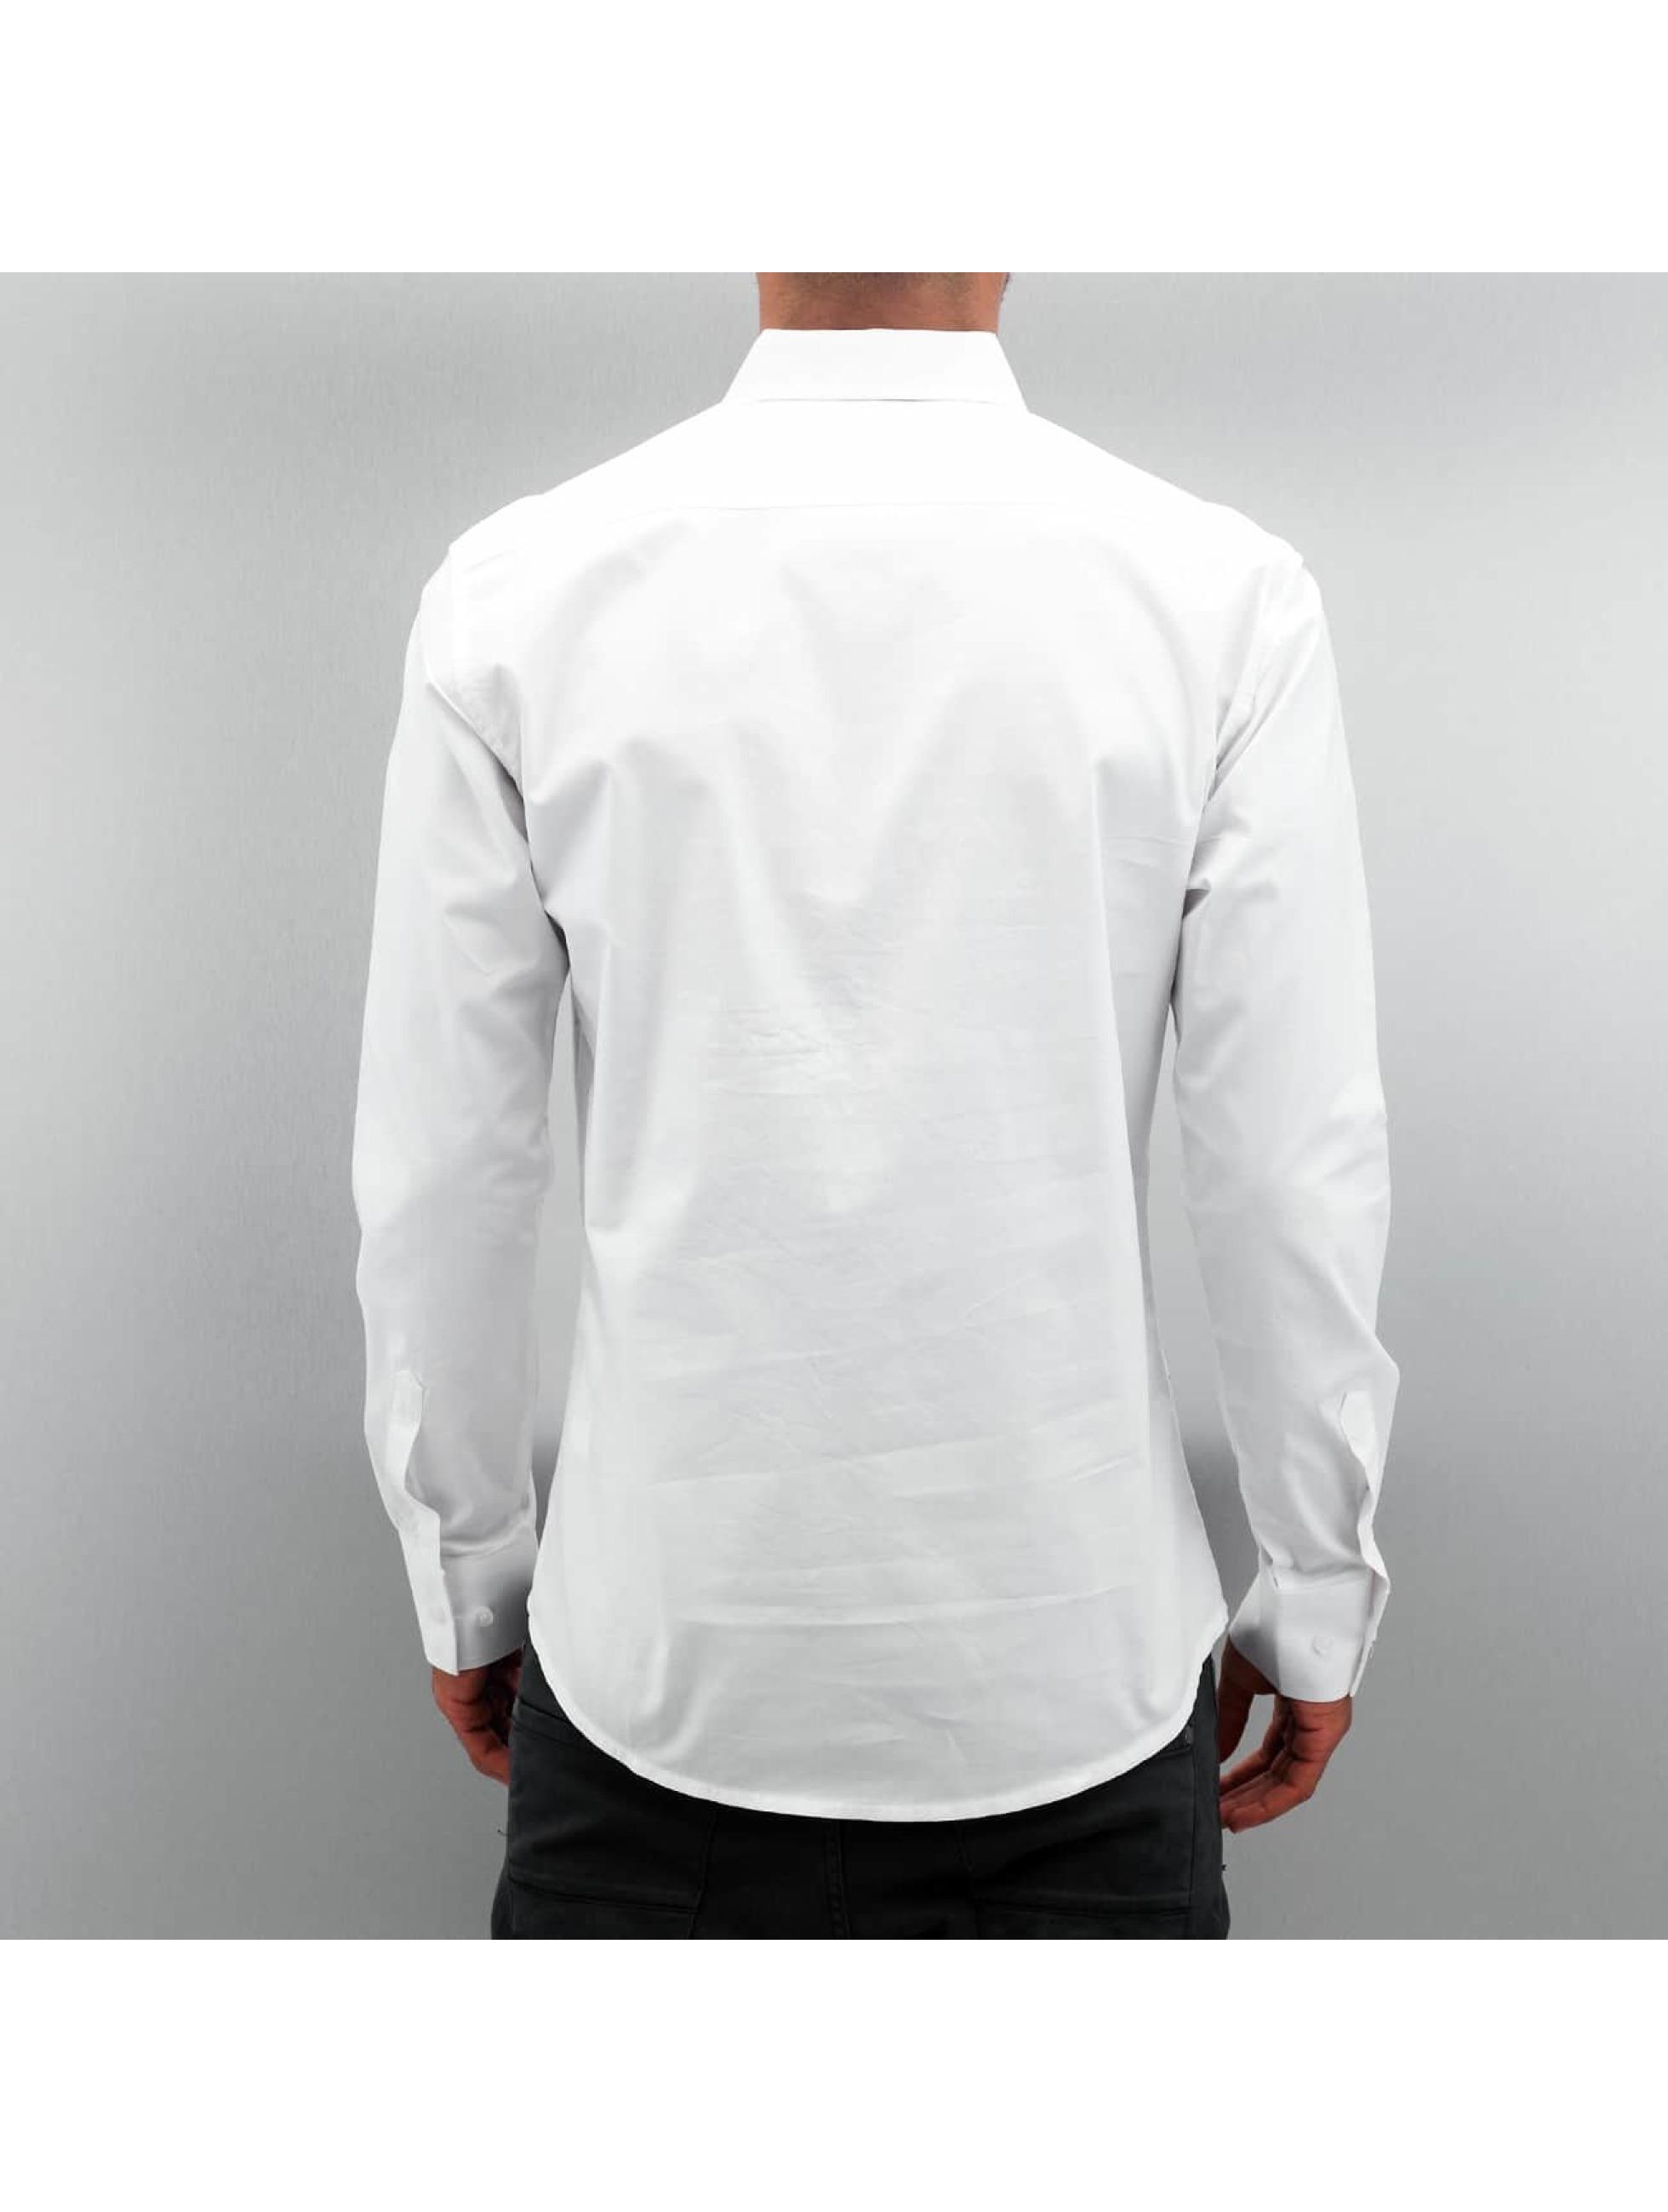 Open overhemd Stitch wit